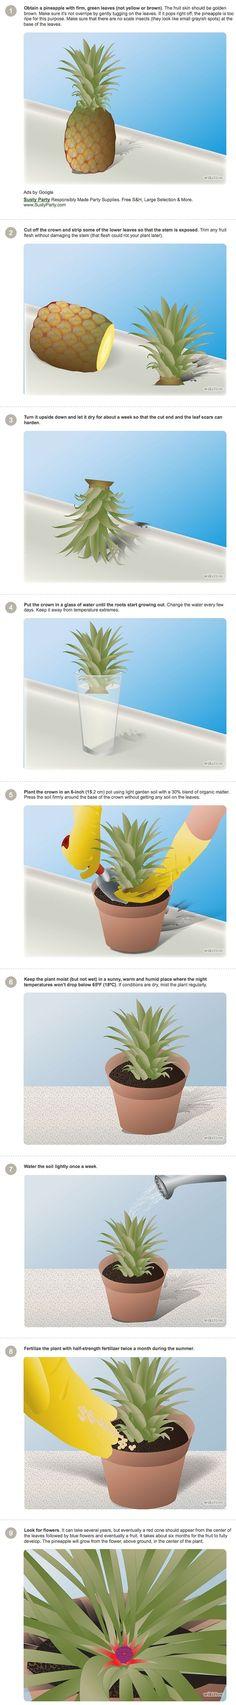 How to grow a pineapple tree!